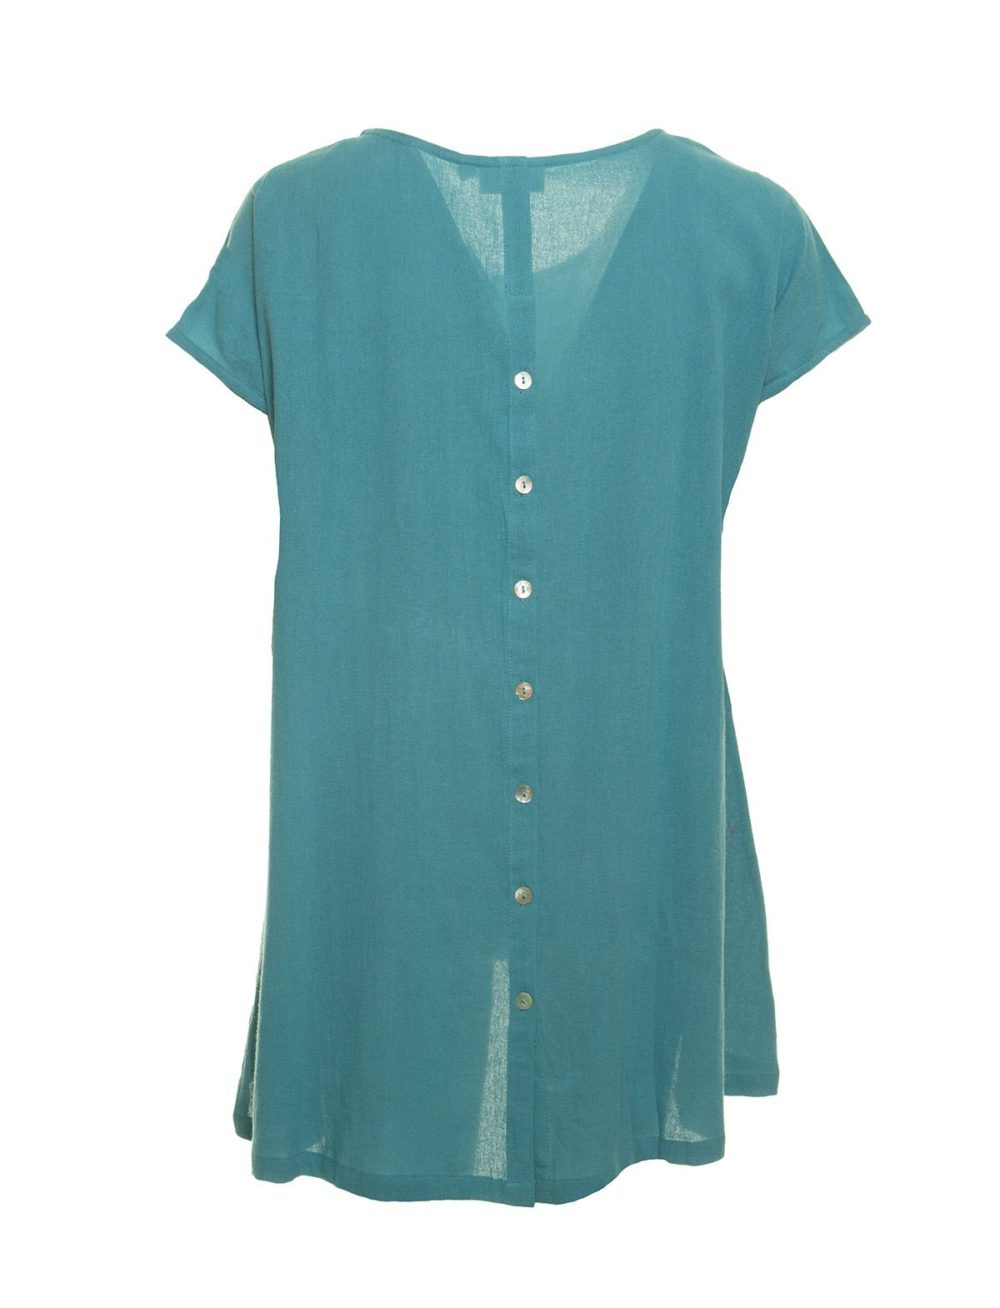 CSH-8005 Top Capri Clothing Katie Kerr Women's Clothing